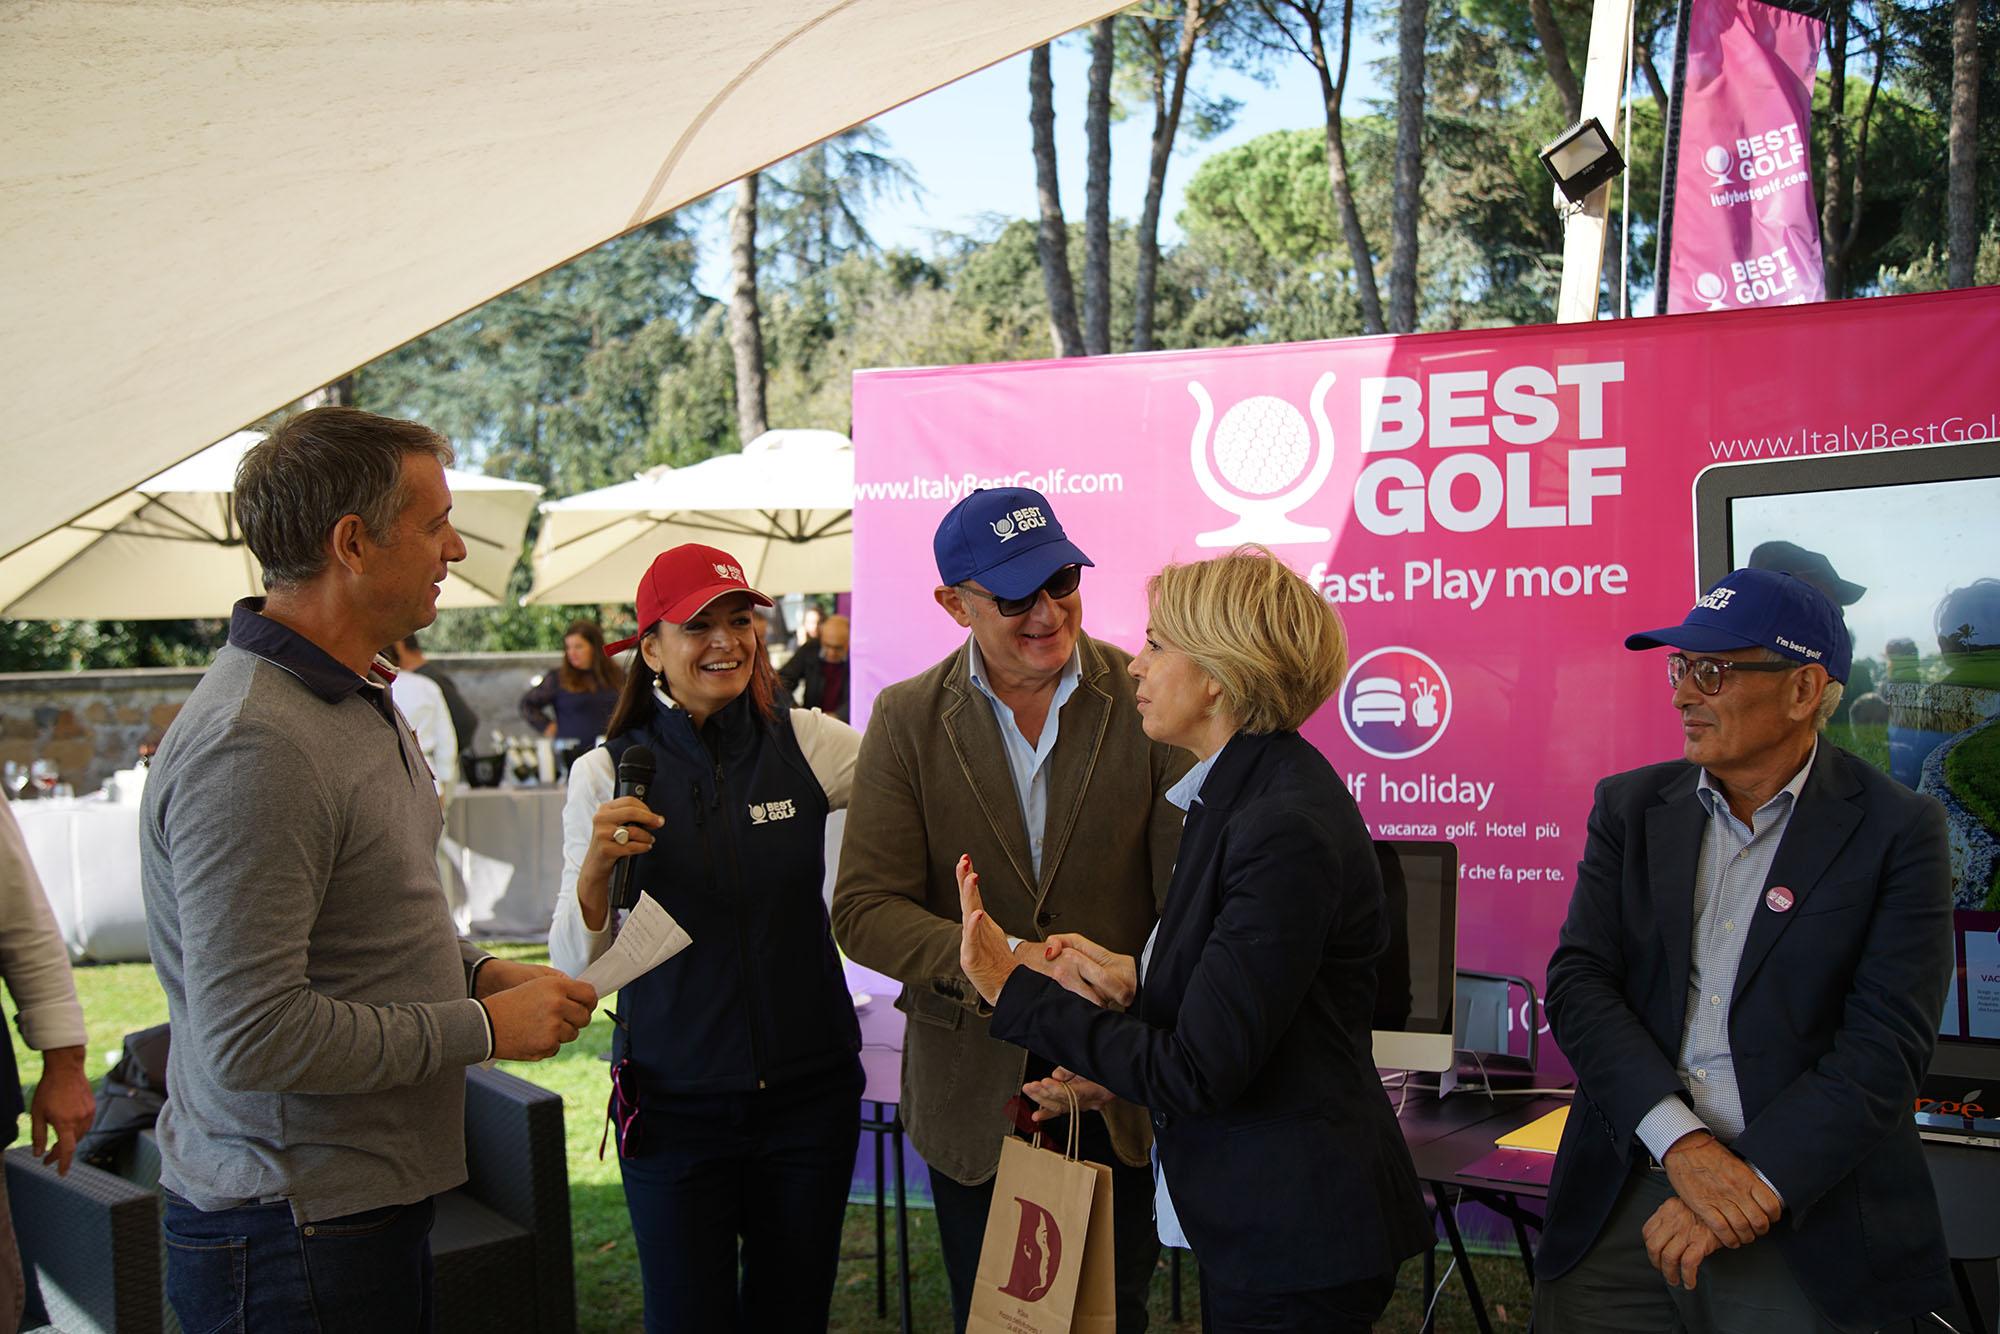 zz-Best-Golf-Day-Travel-MeetingDSC02635